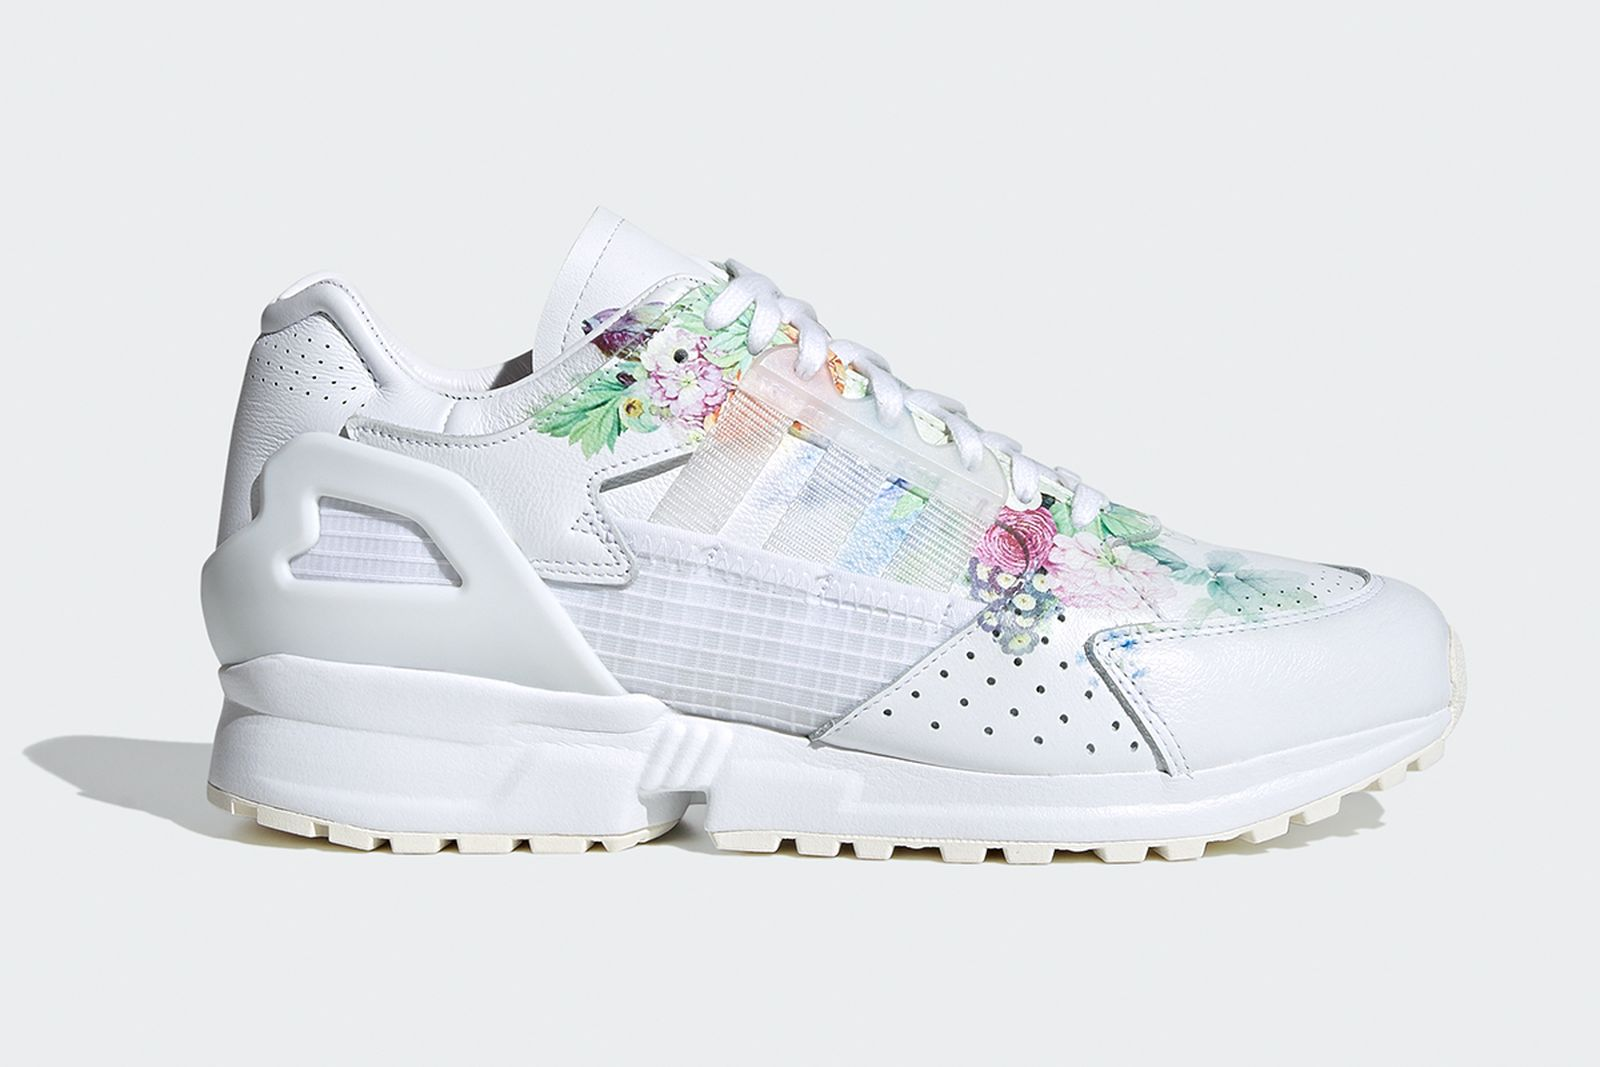 meissen-adidas-originals-zx-10000-c-release-date-price-01